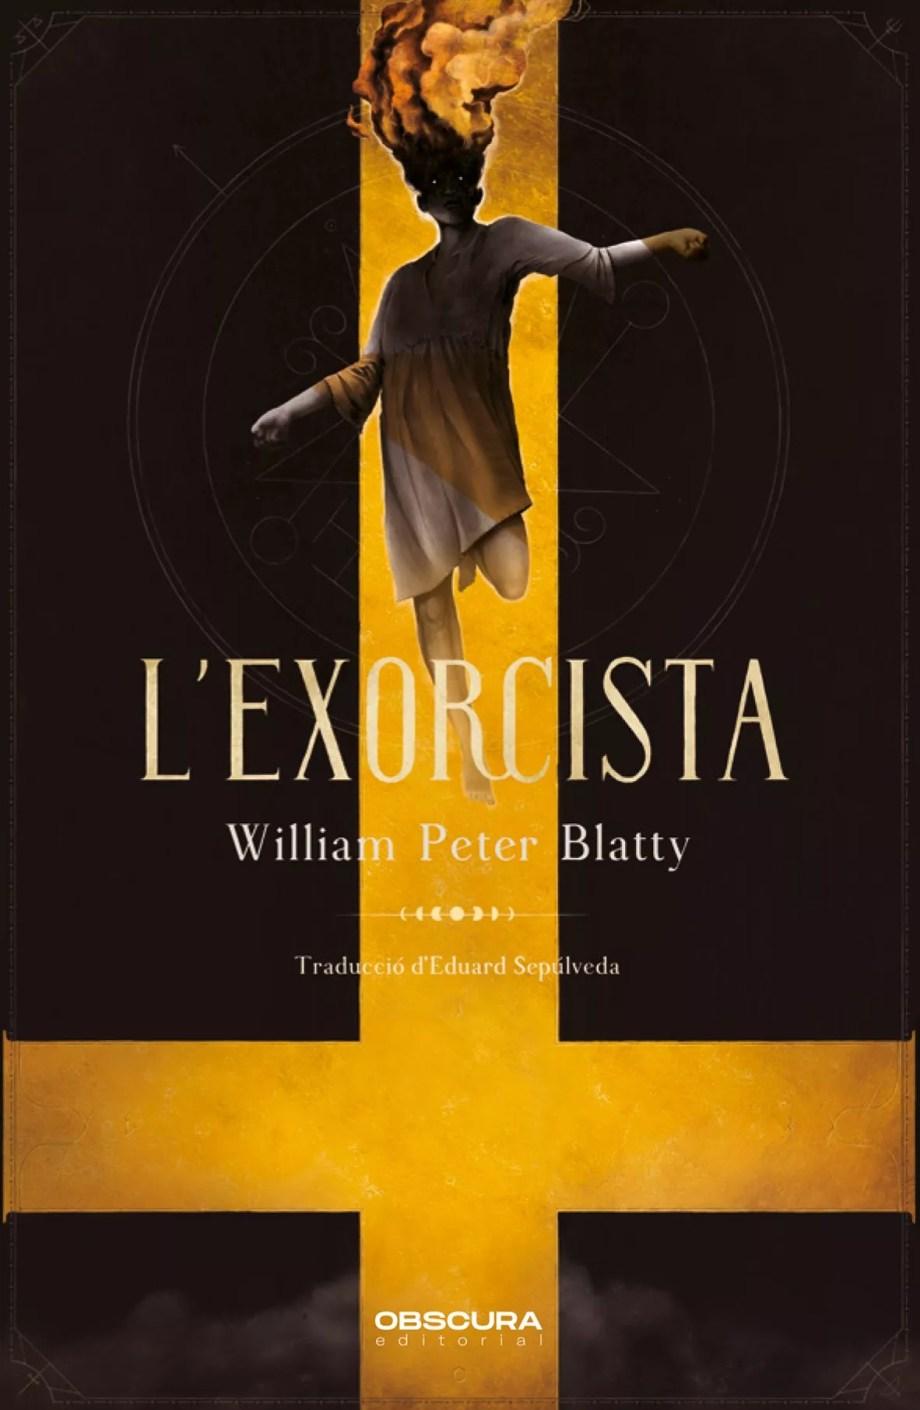 exorcista william peter blatty català terror obscura editorial novel·la